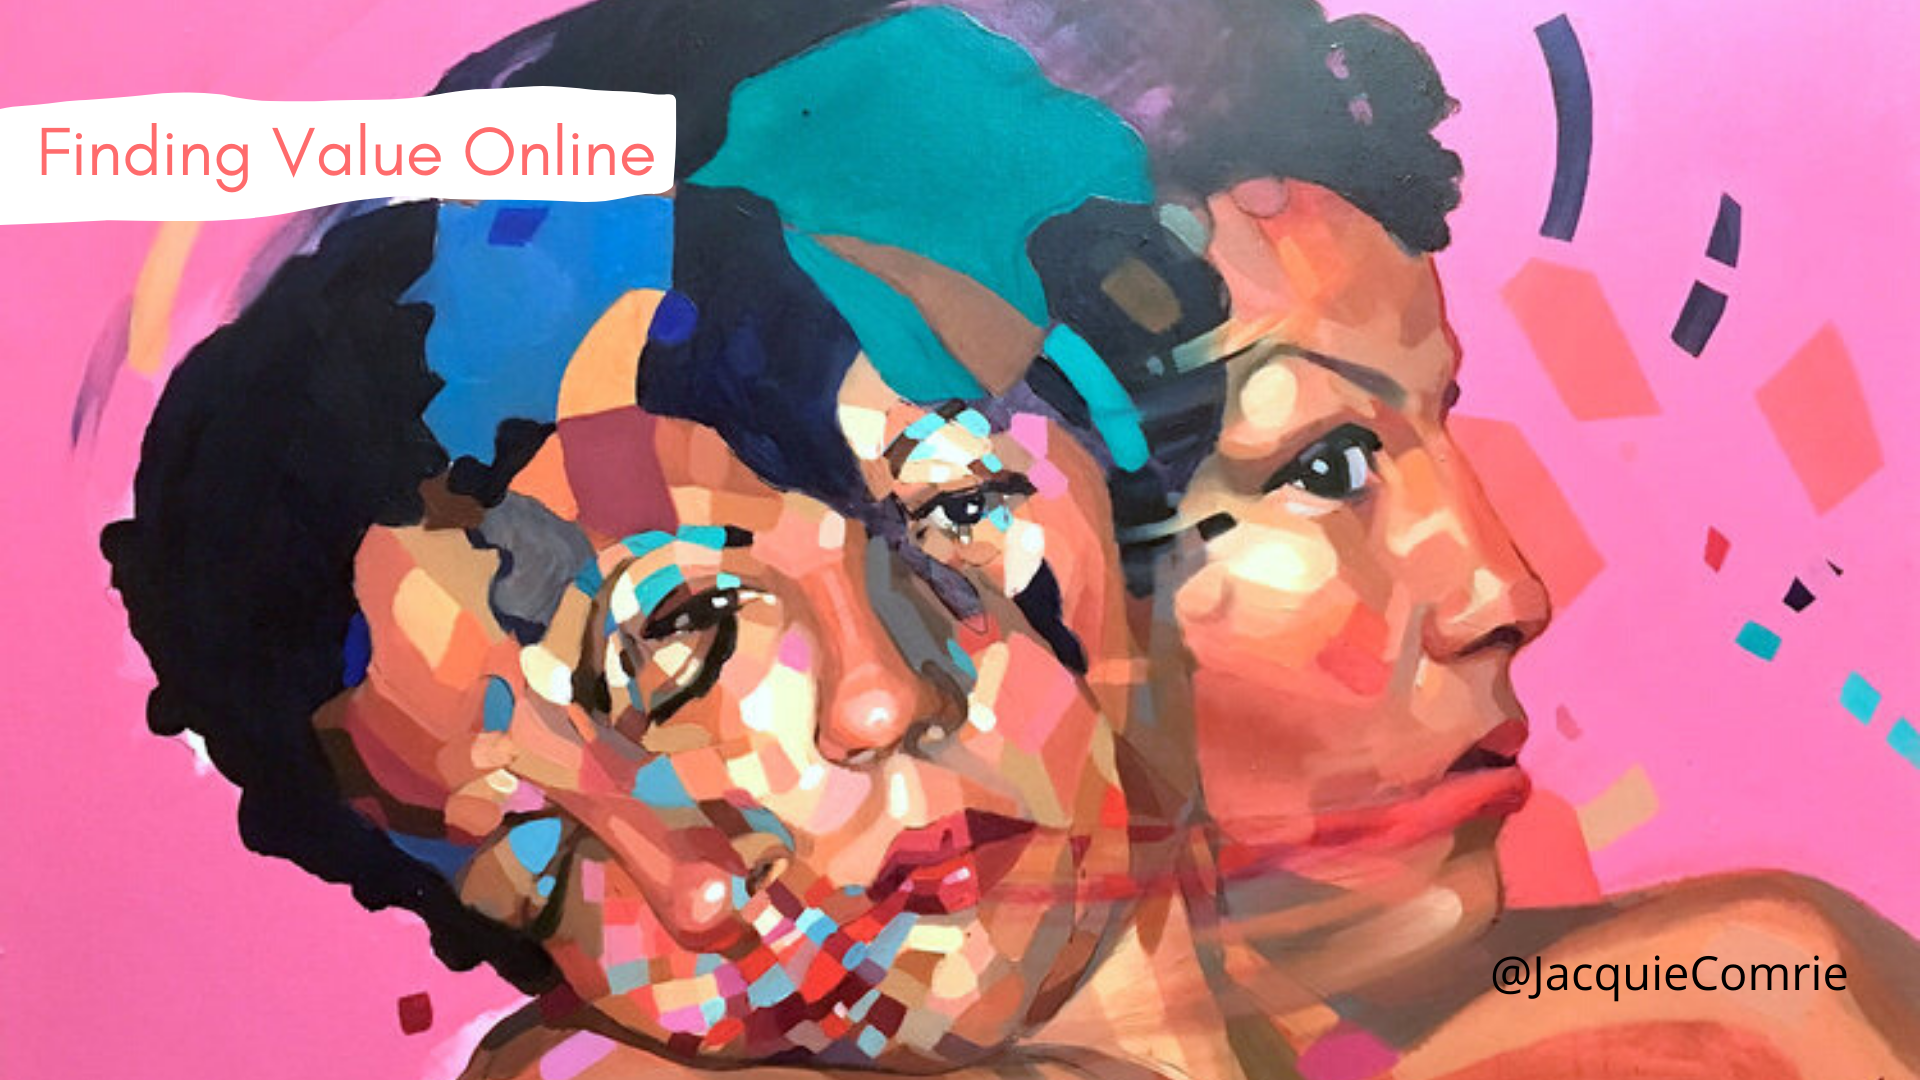 Finding Value Online Art